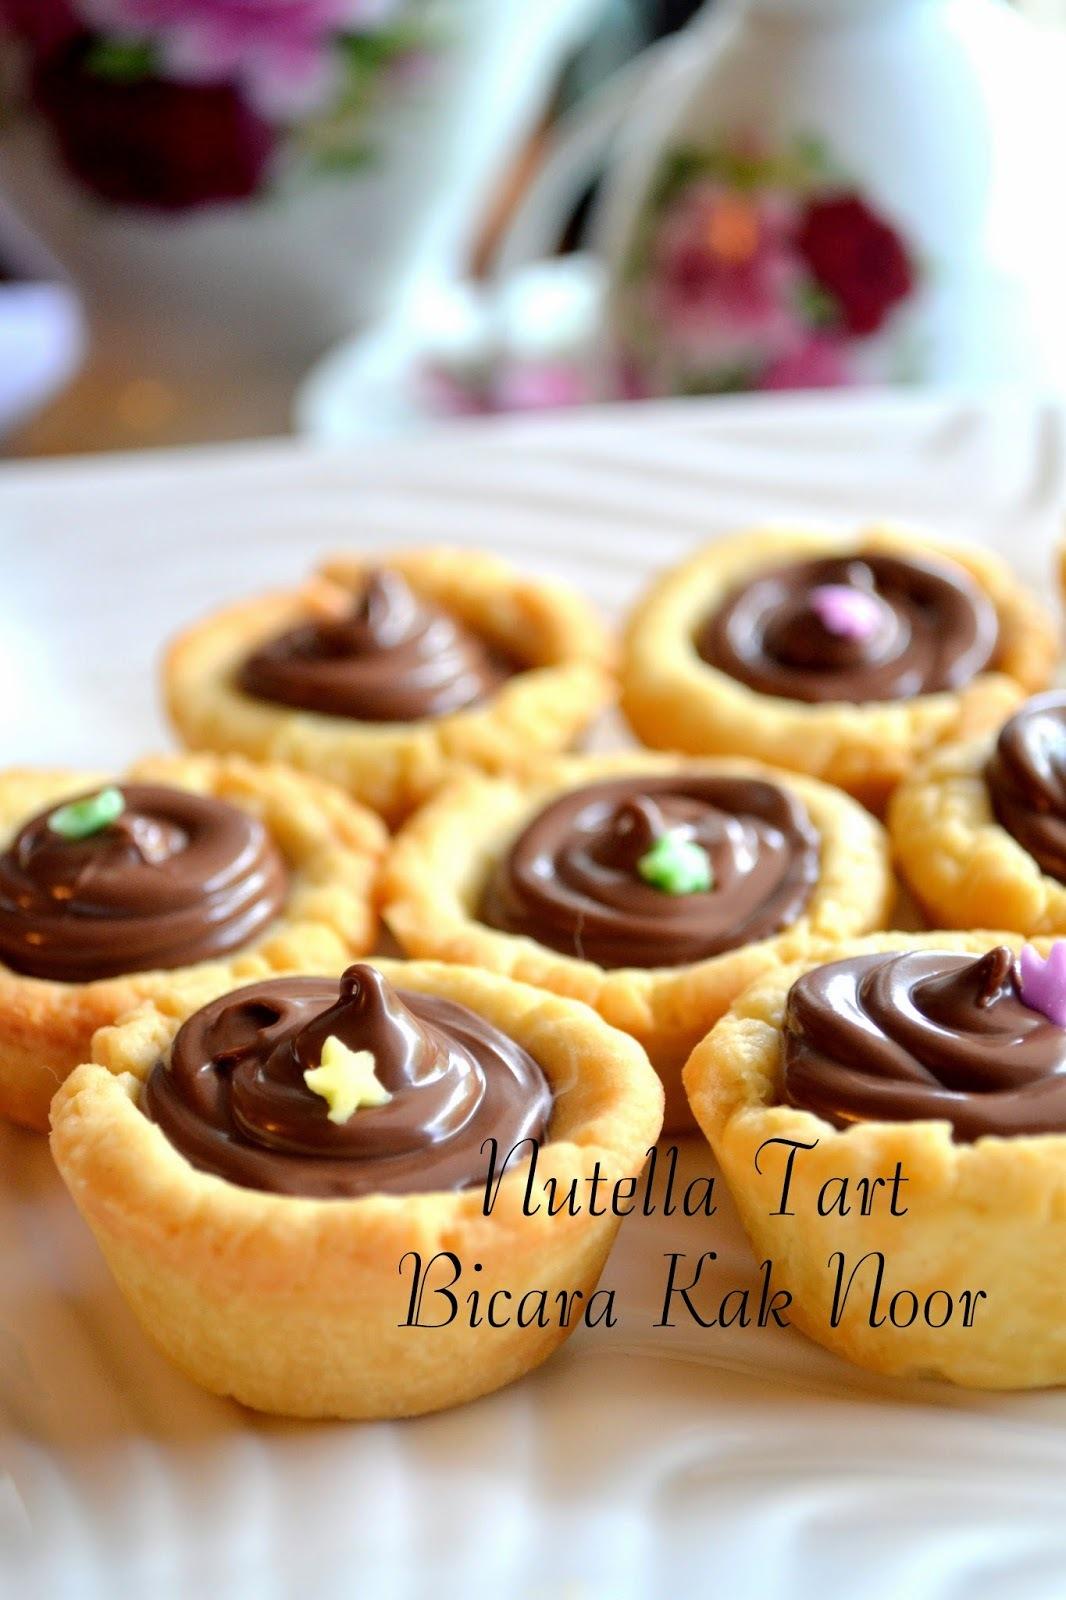 Nutella Tart yang Sangat Sedap Resepi Pinterest Lagiii..